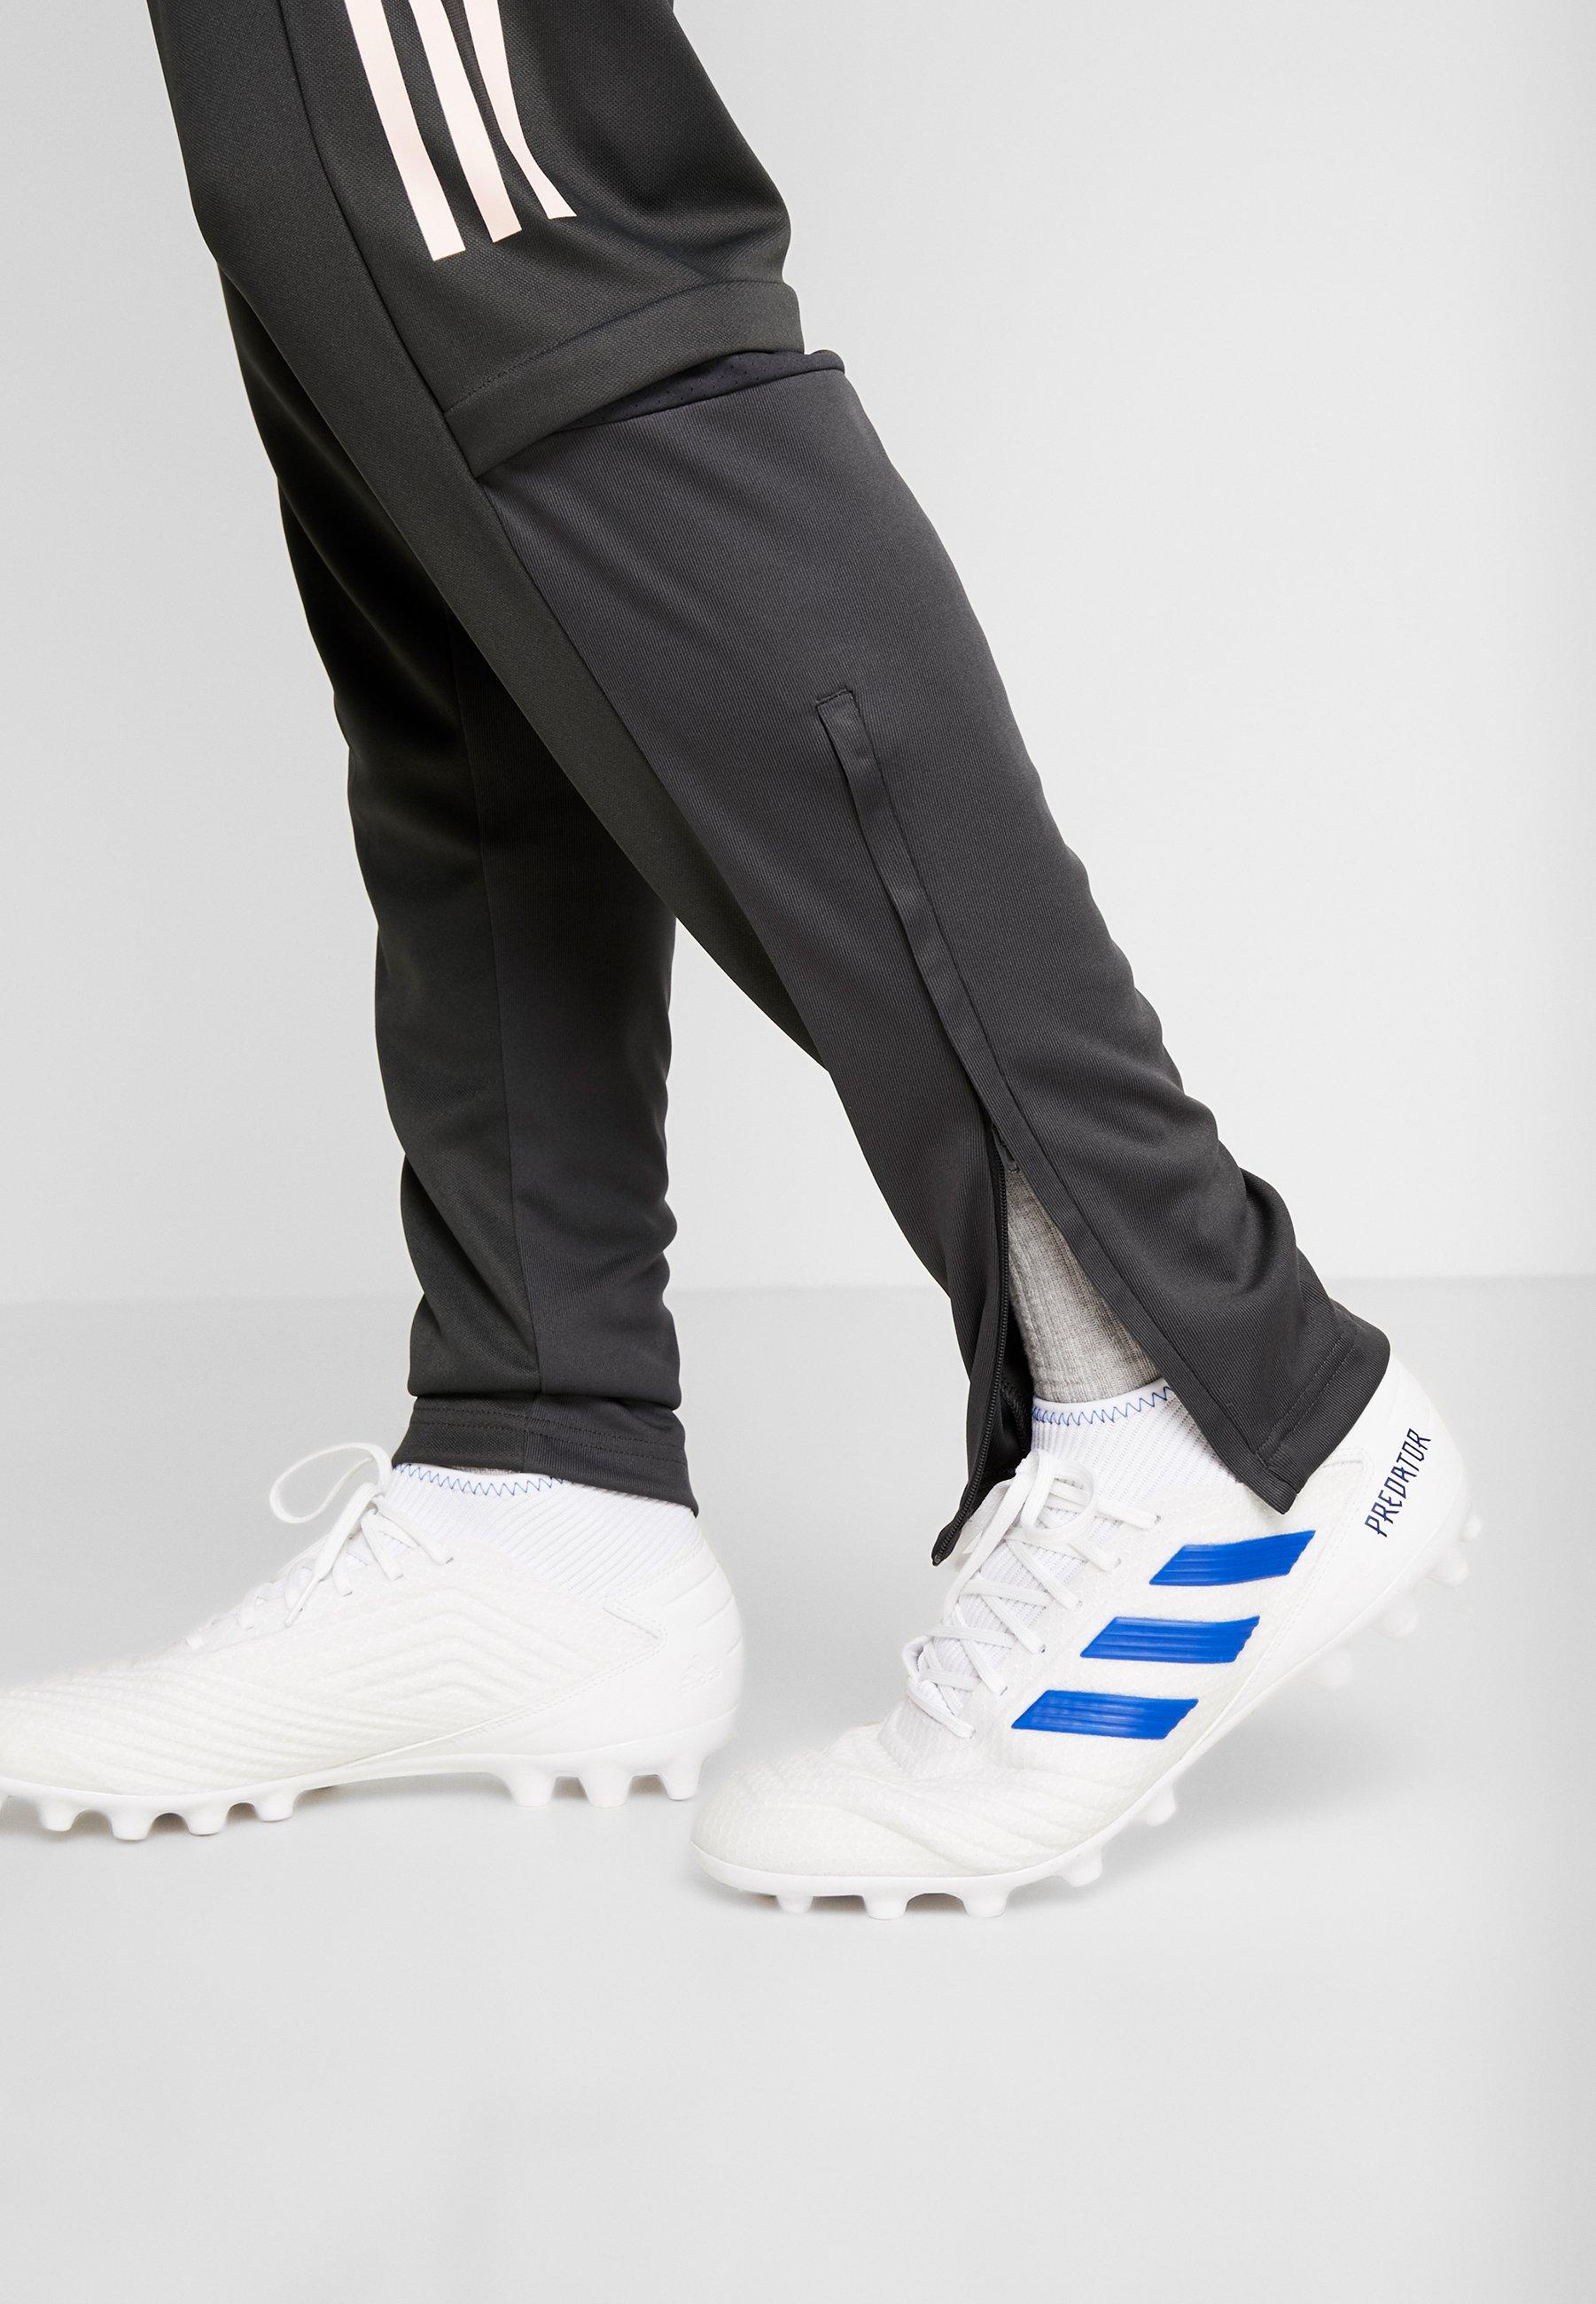 Men DEUTSCHLAND DFB TRAINING PANT - National team wear